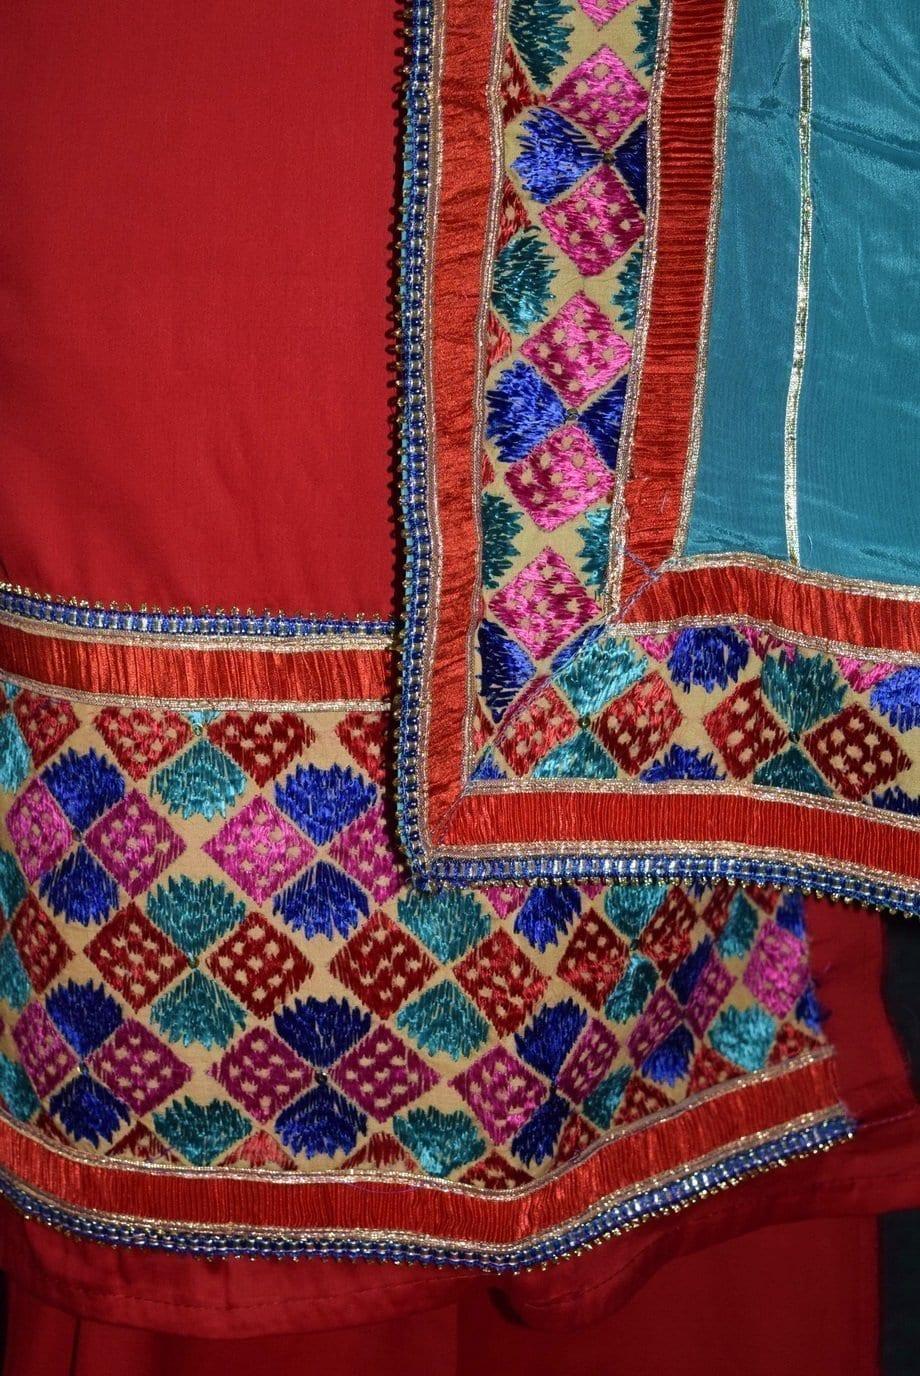 Glazed Cotton Hand Embroidered Salwar kameez suit CHINON DUPATTA set F0658 4